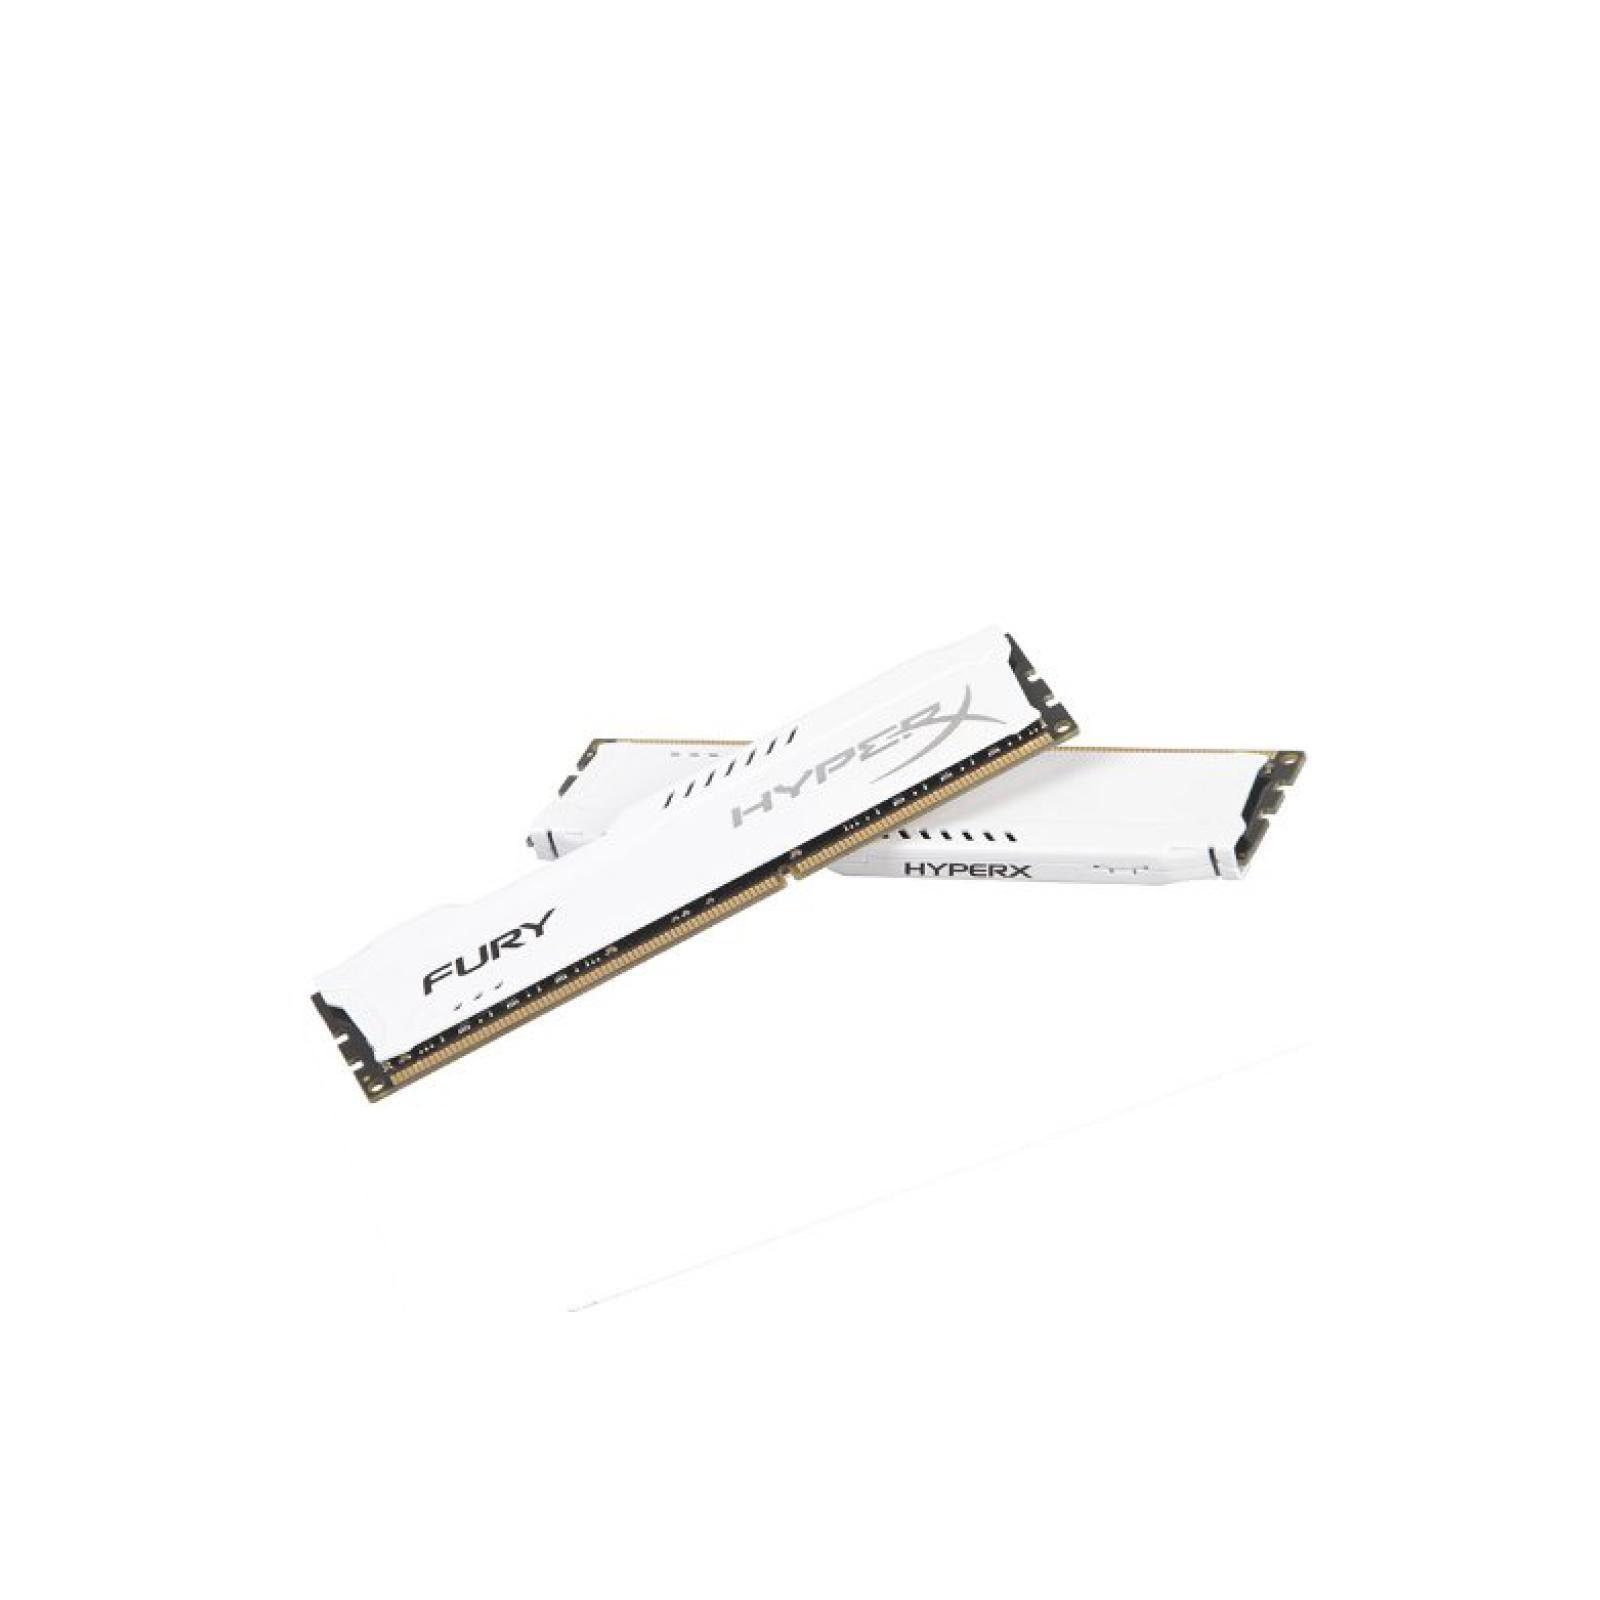 Модуль памяти для компьютера DDR4 16GB (2x8GB) 3200 MHz HyperX FURY White HyperX (Kingston Fury) (HX432C18FW2K2/16) изображение 4